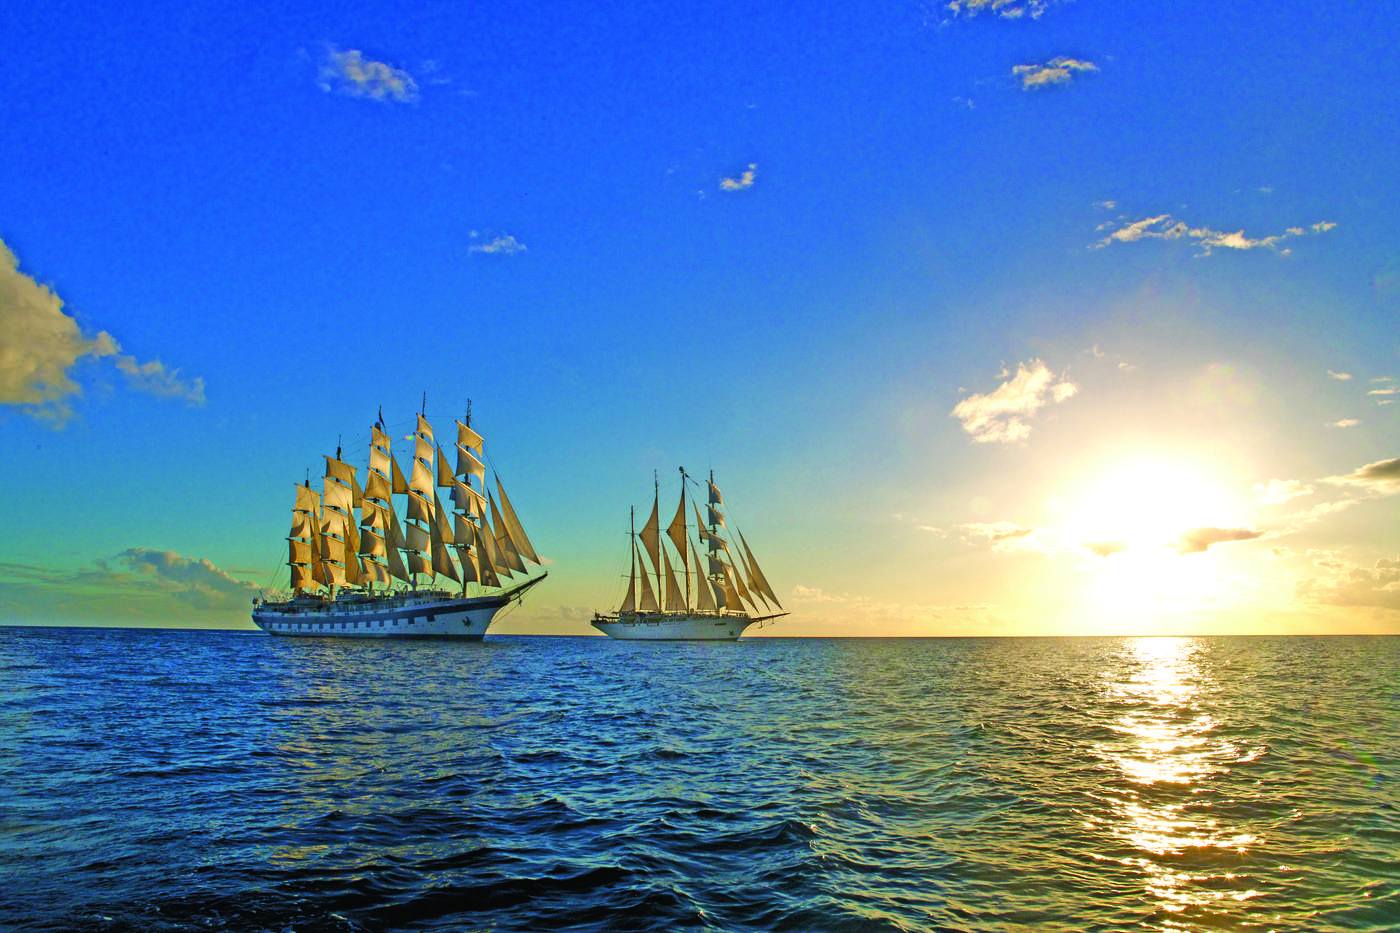 sc-ship_RC_SC_sailing_sunset